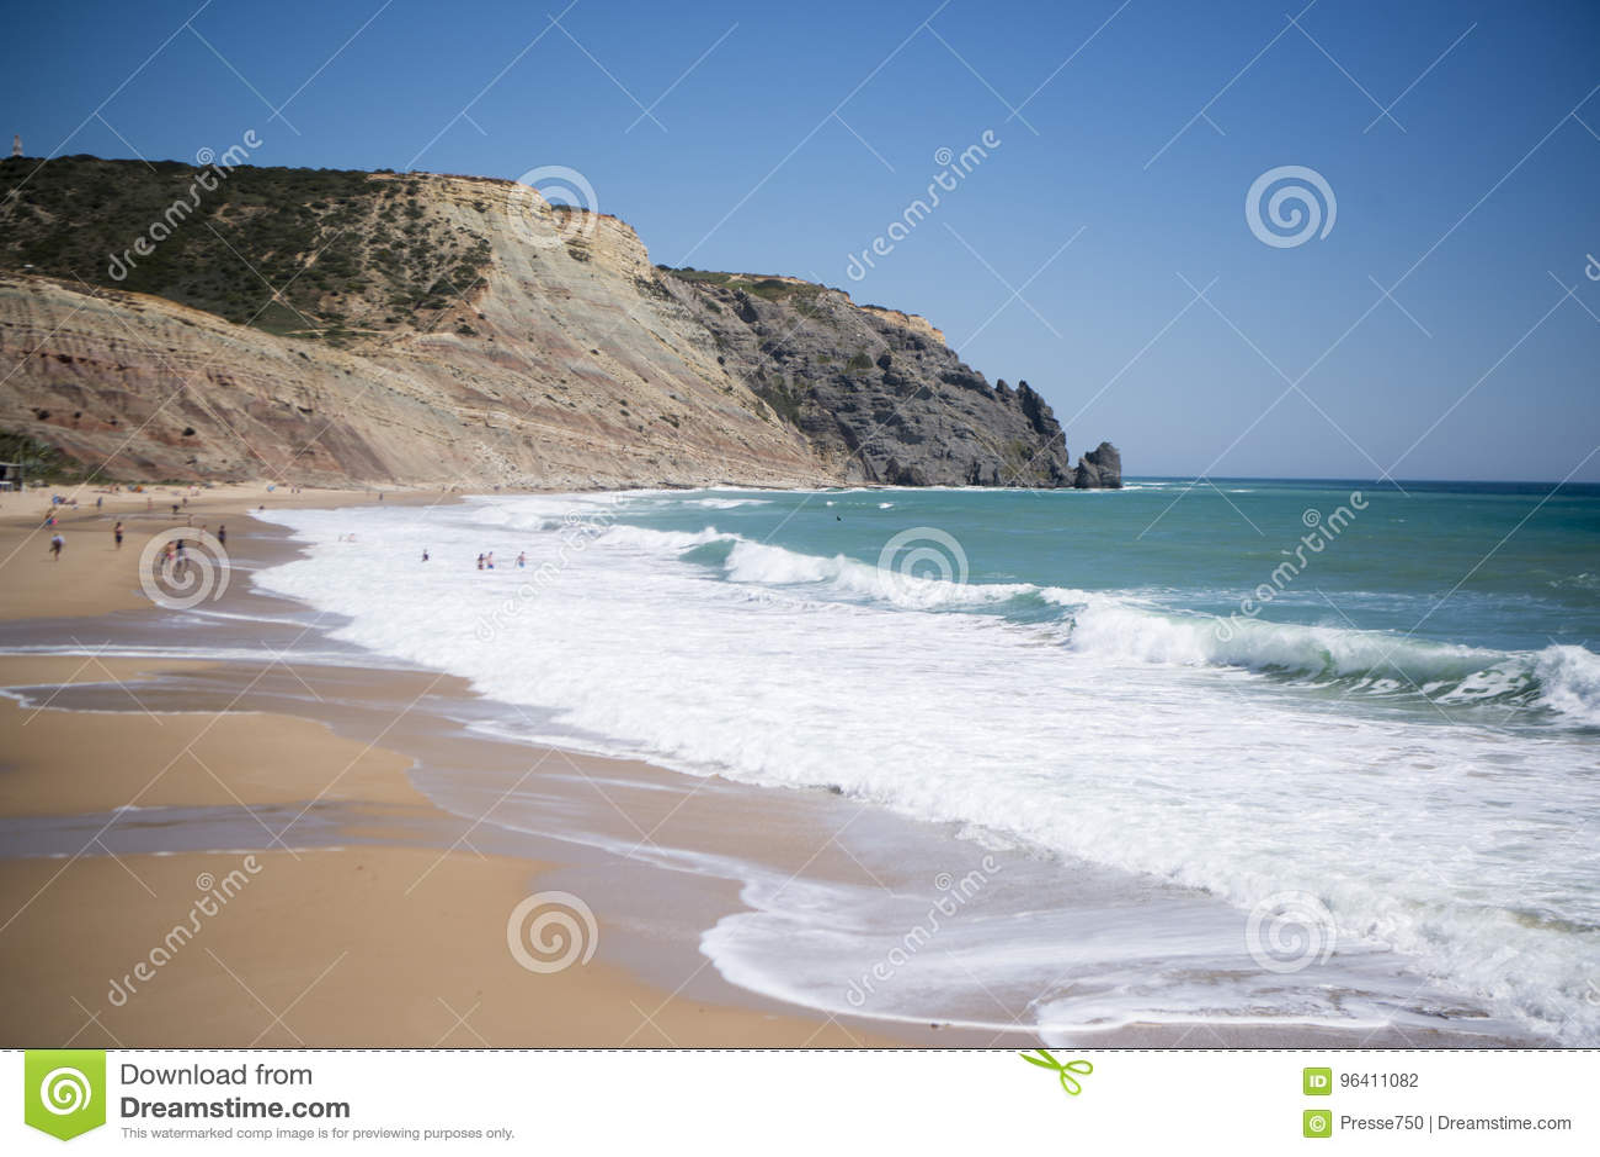 Download PORTUGAL ALGARVE LUZ BEACH stock photo. Image of algarve - 96411082